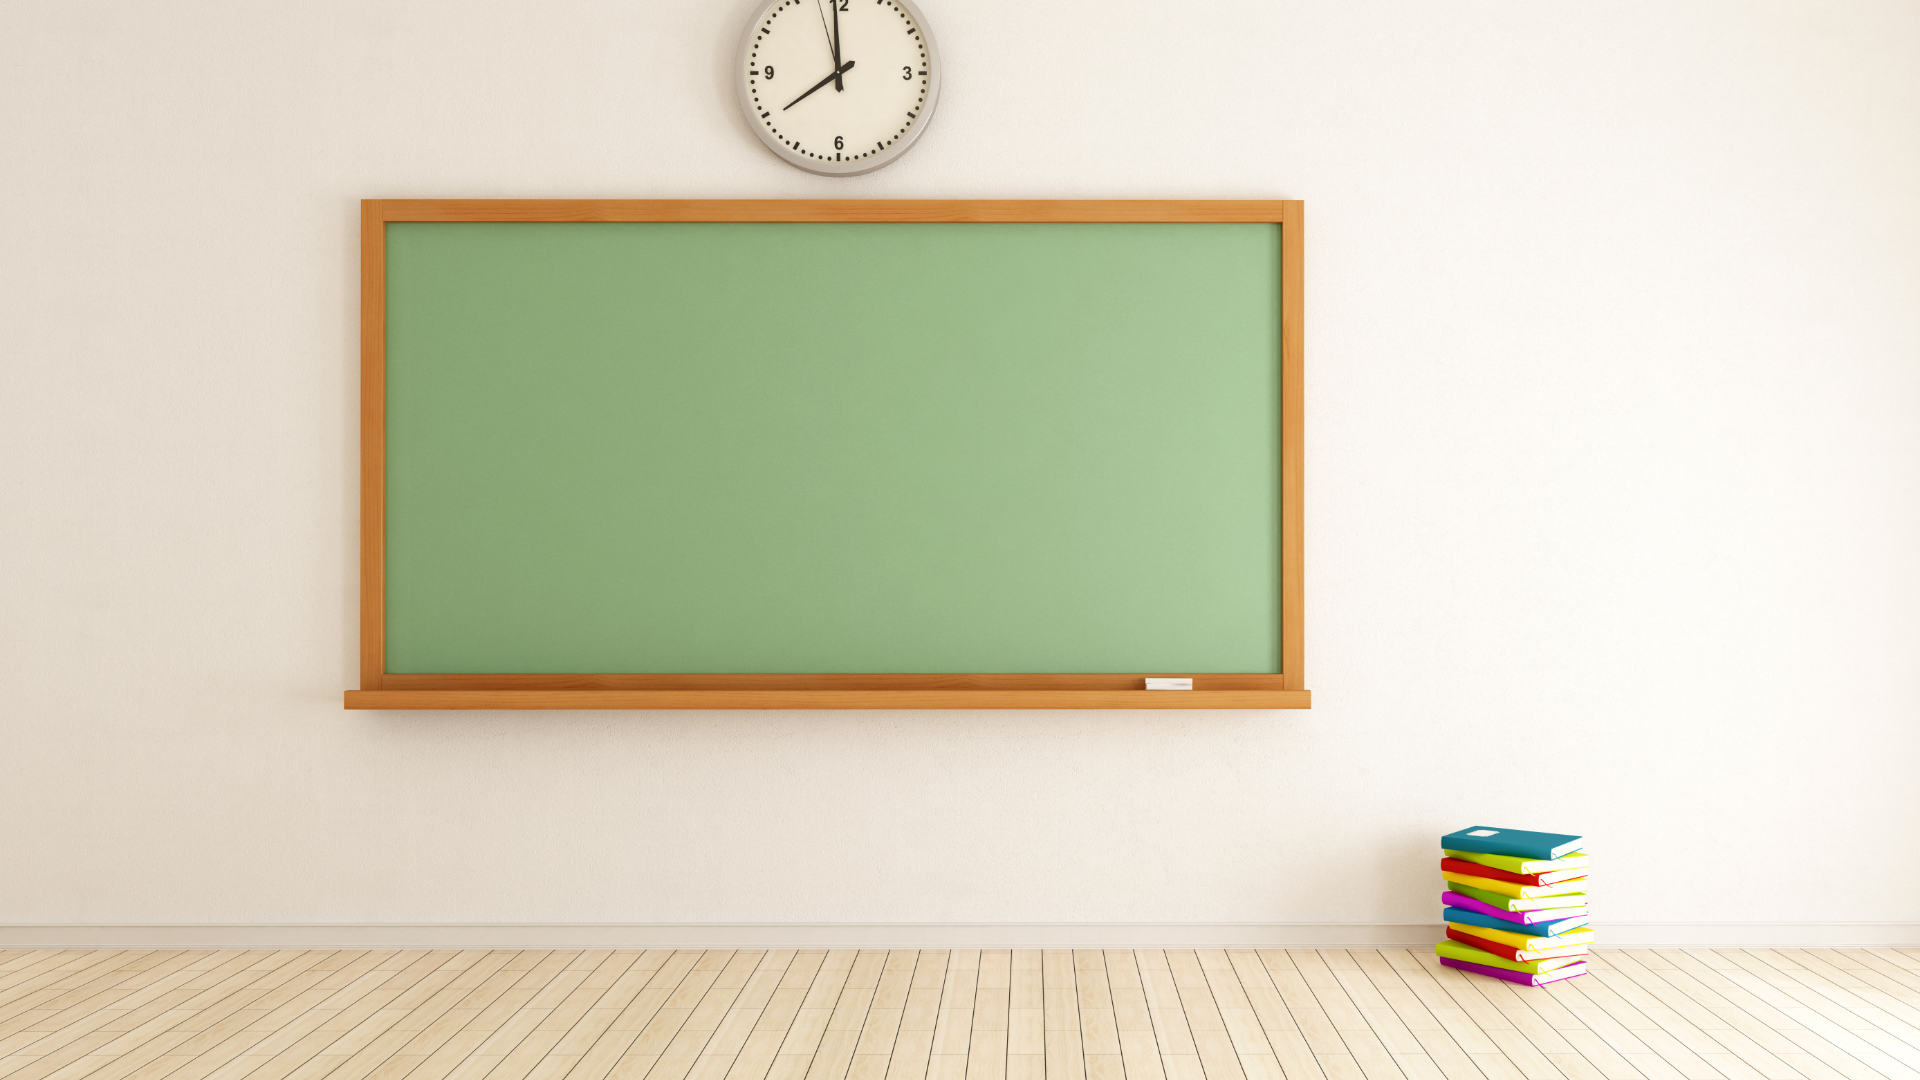 empty school room with chalkboard